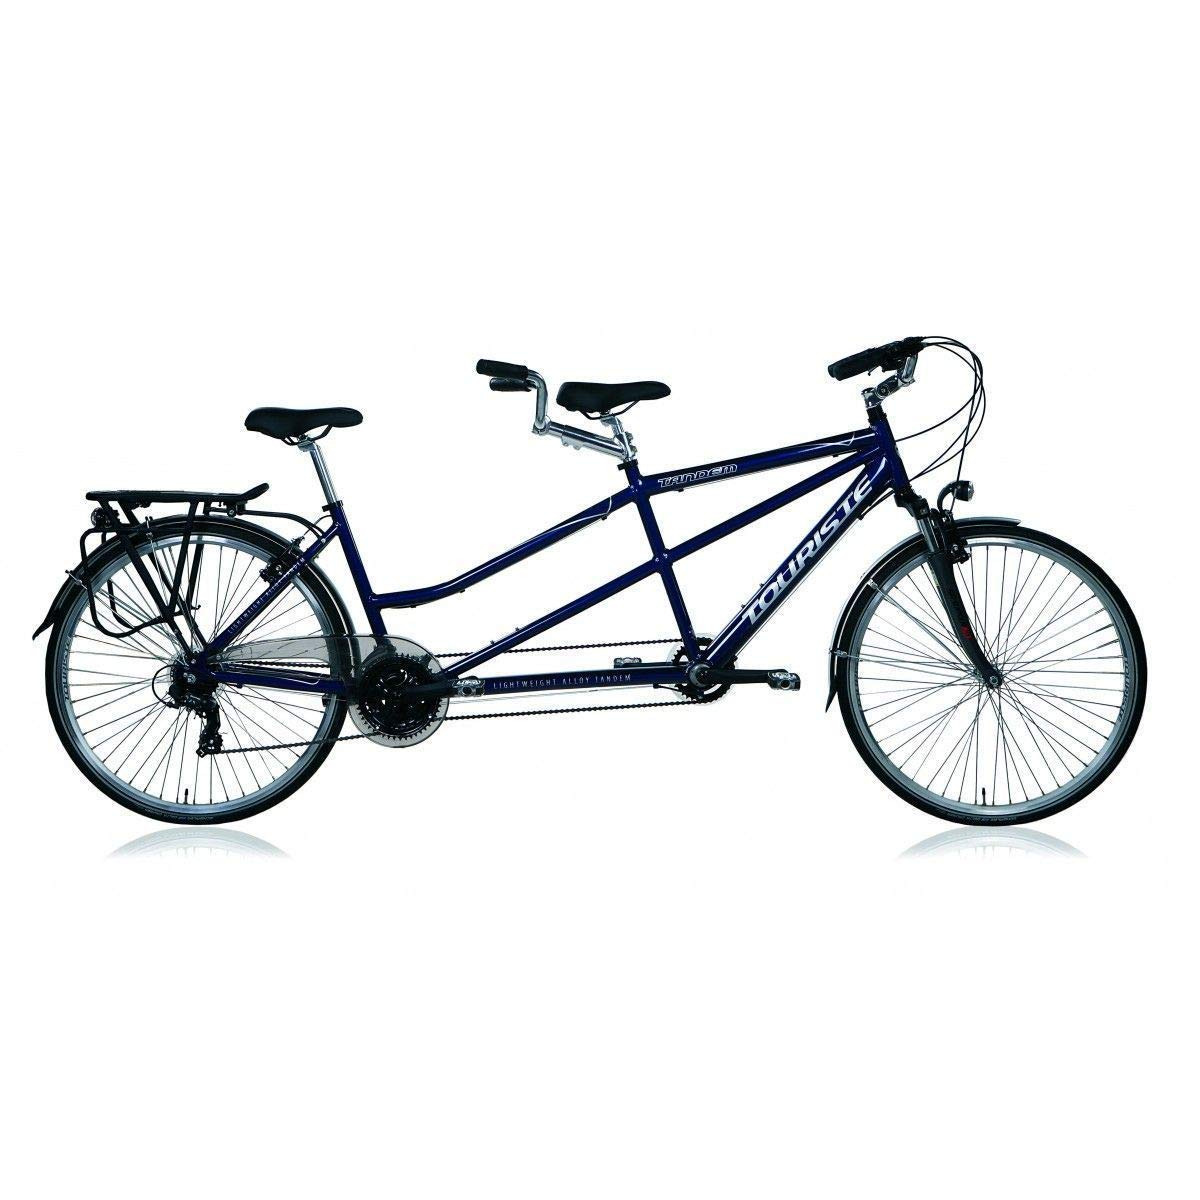 Bicicleta Tandem touriste 28 -H20: Amazon.es: Deportes y aire libre